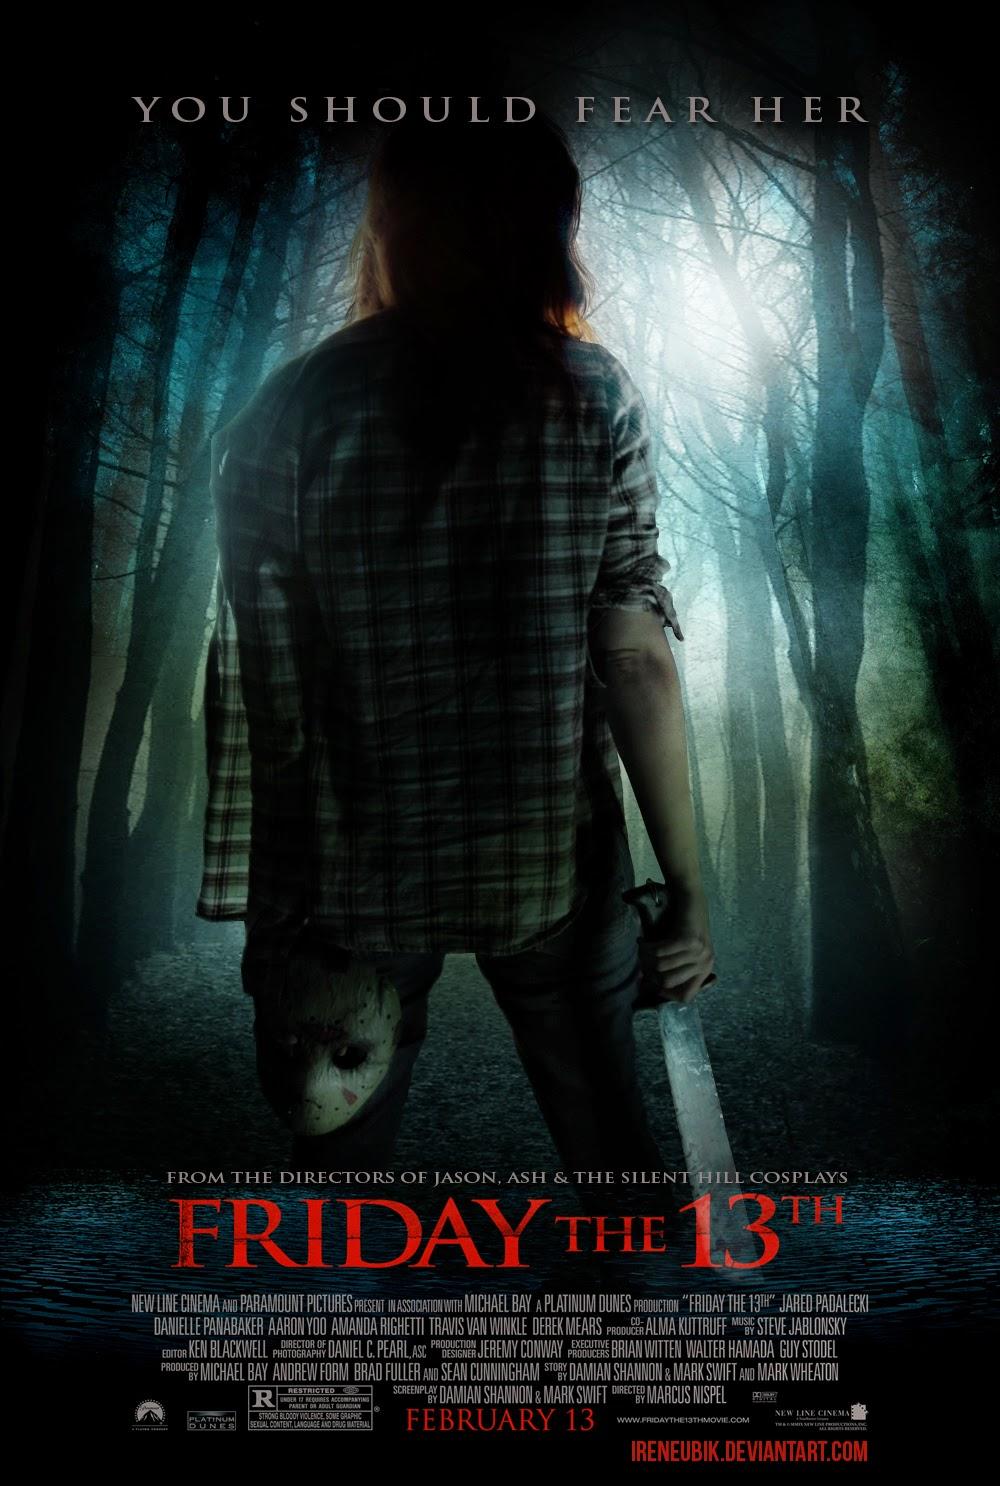 Friday the 13th ศุกร์ 13 ฝันหวาน Part 1 [HD][พากย์ไทย]